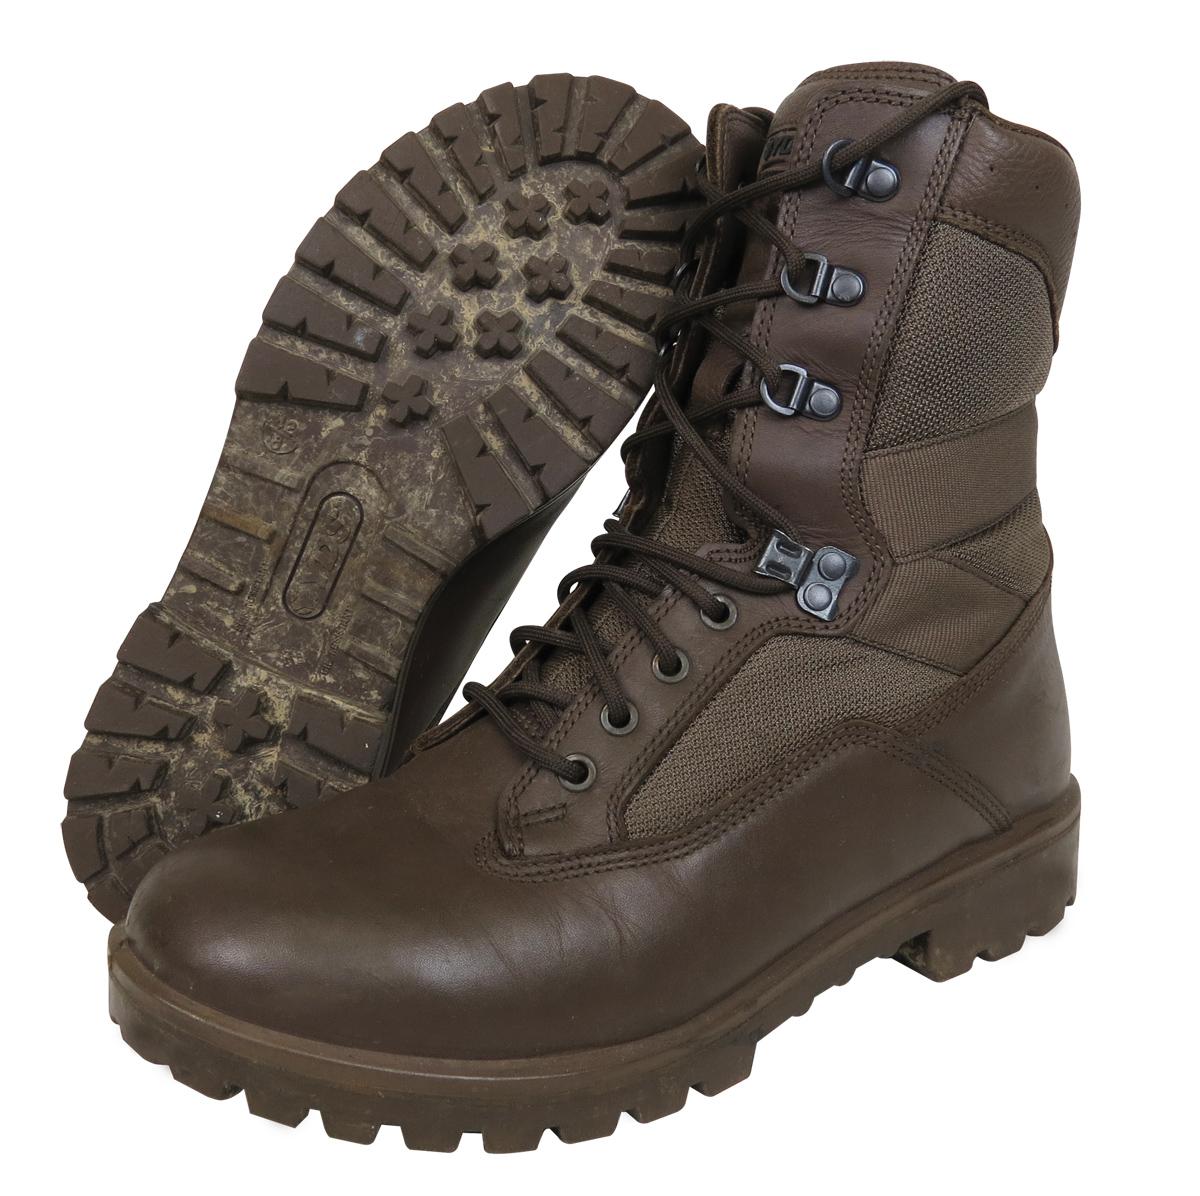 Ex Army Brown Patrol Boots Mens Yds Kestrel By British